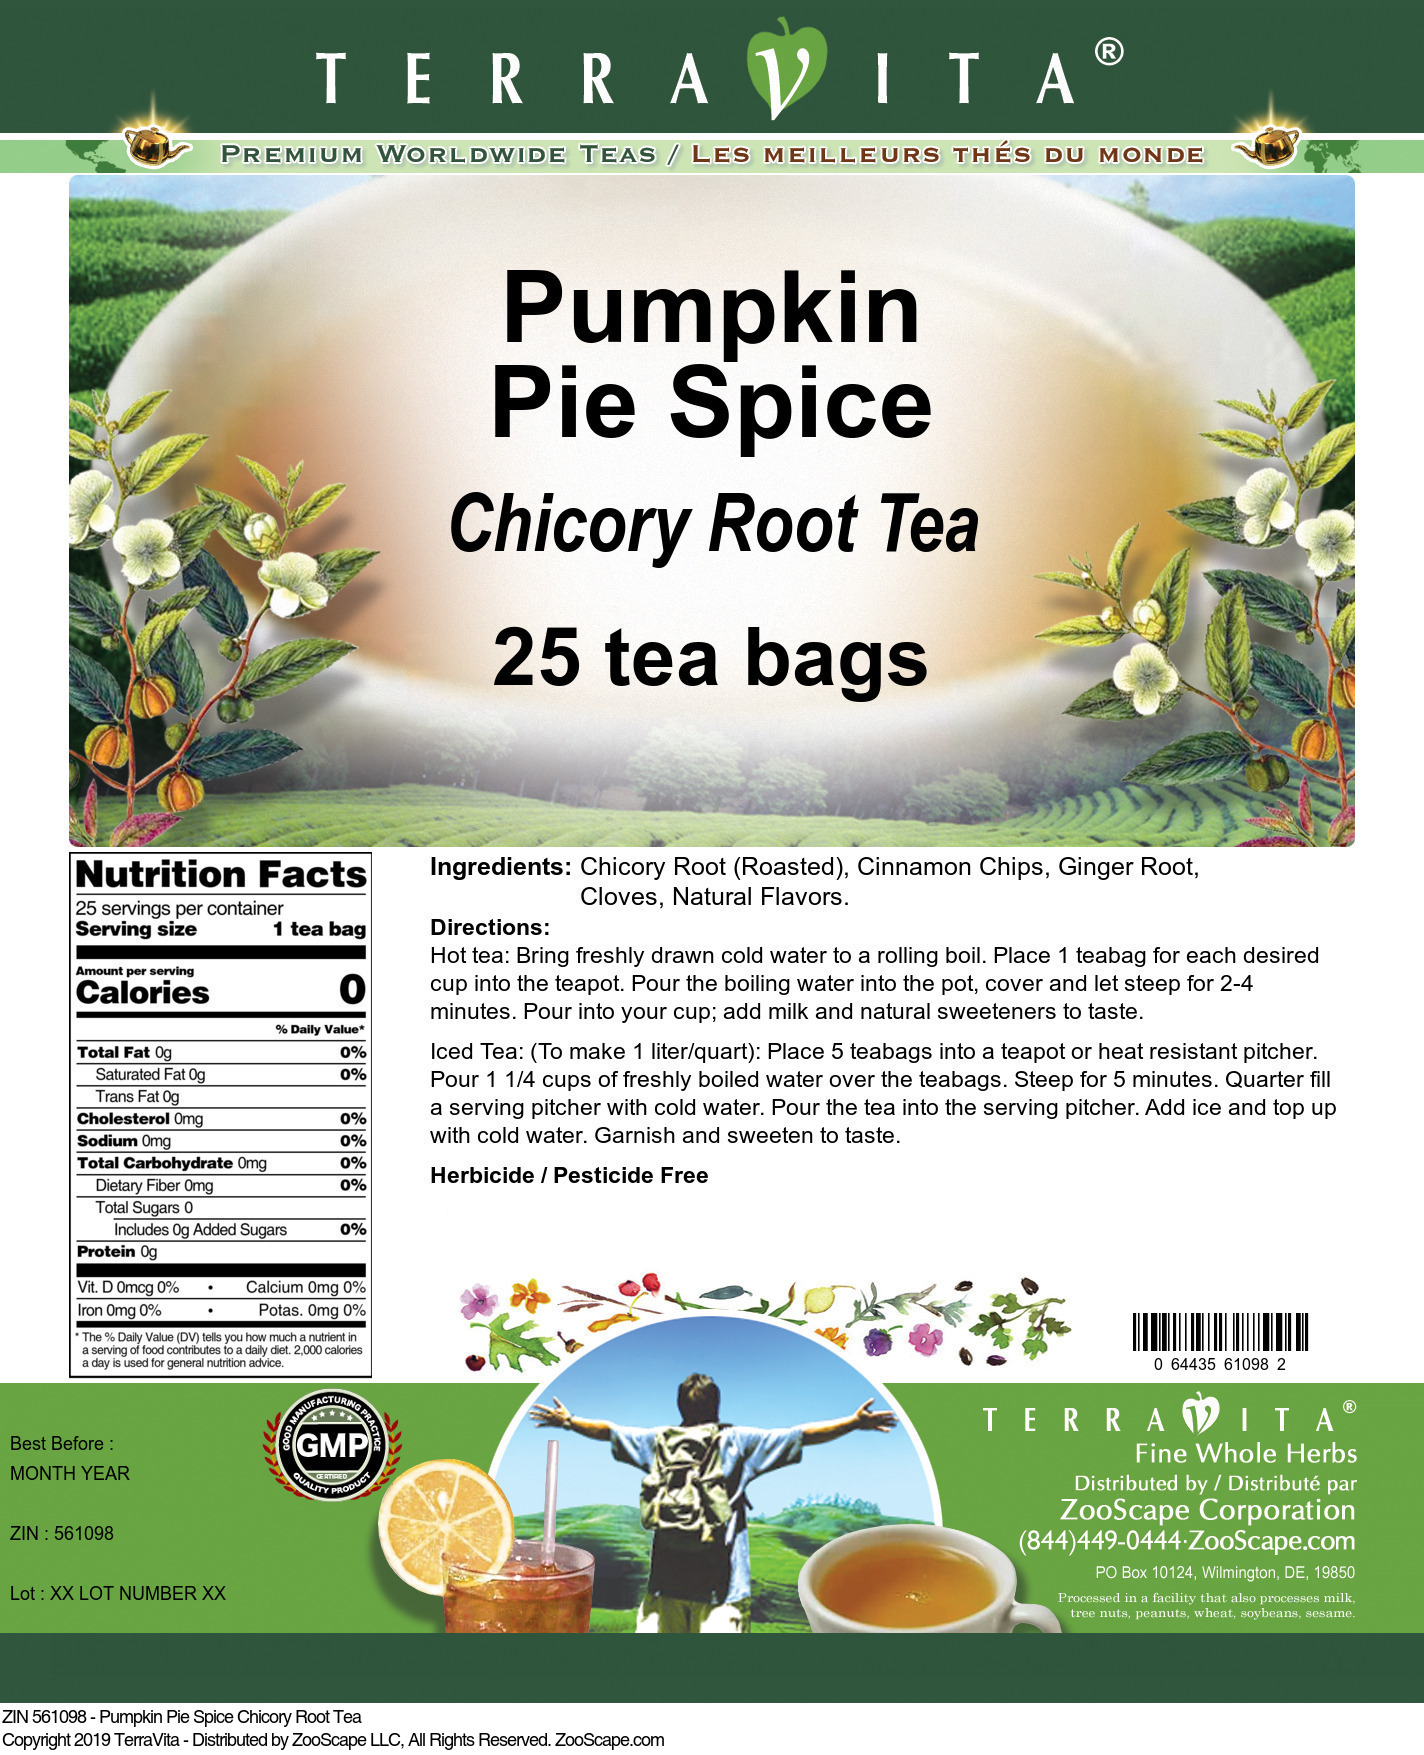 Pumpkin Pie Spice Chicory Root Tea